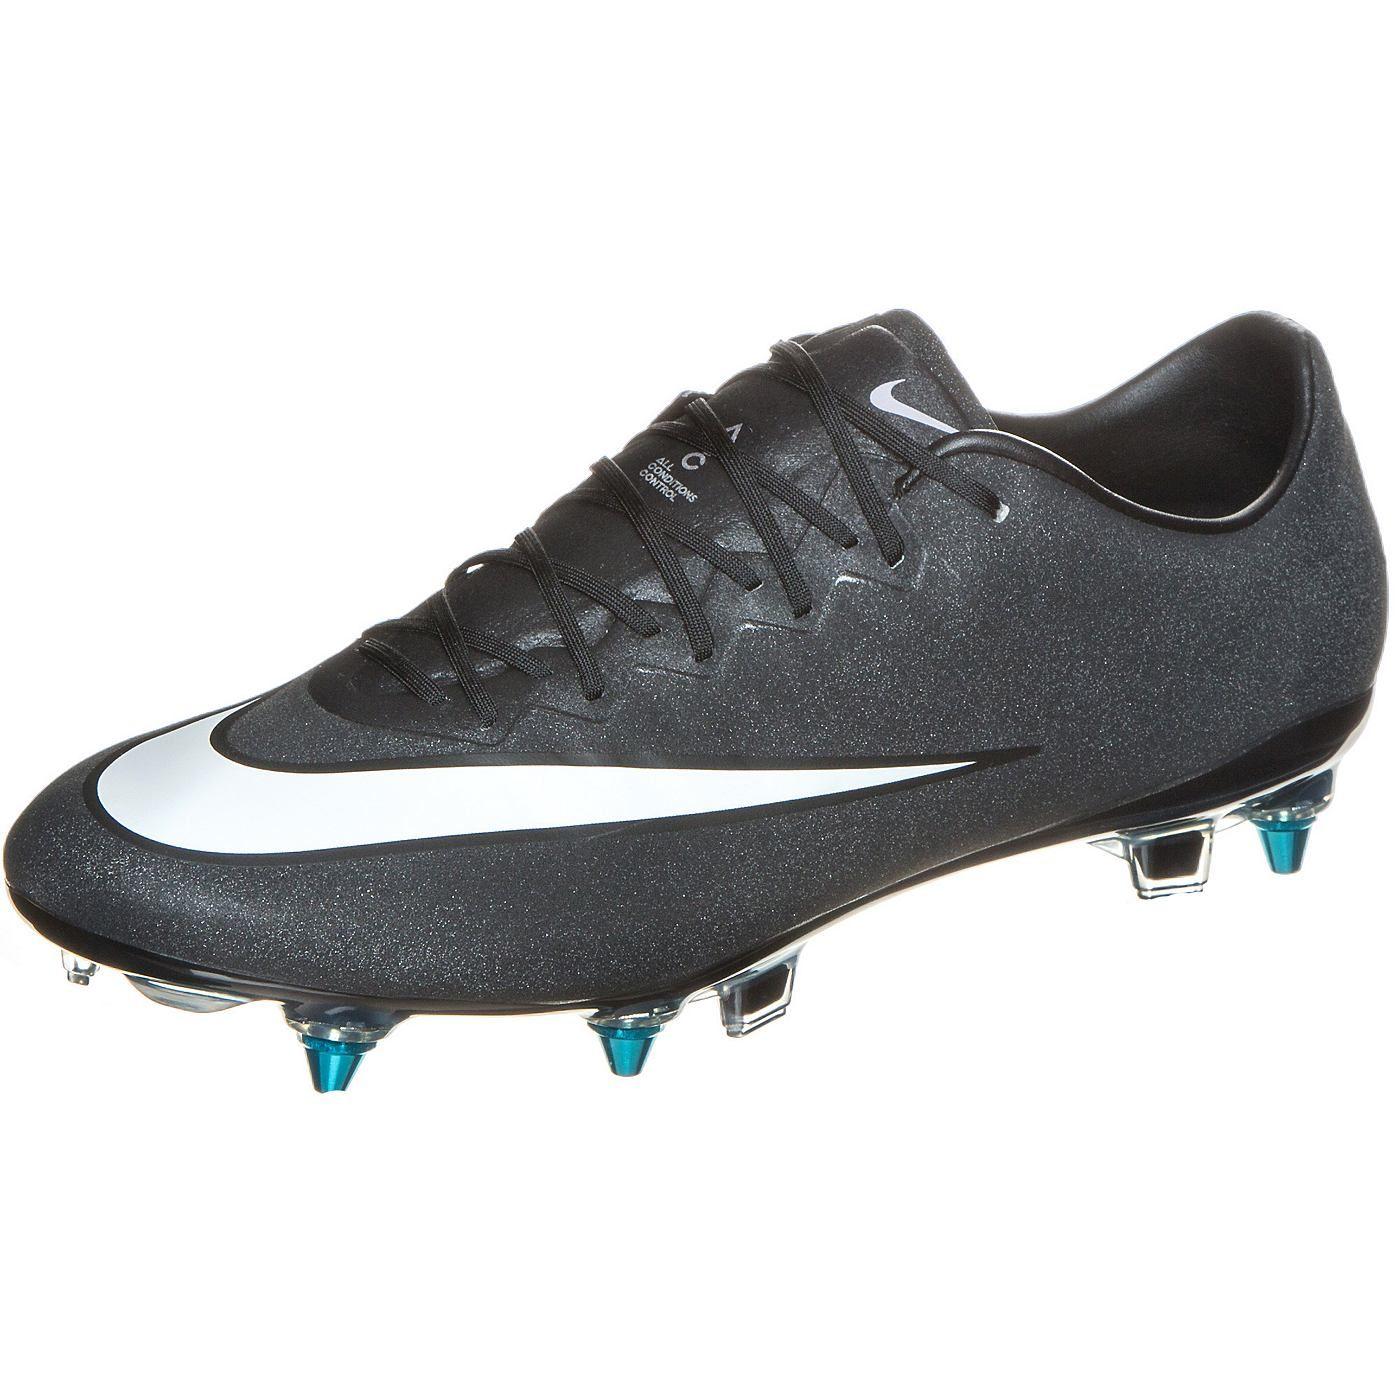 Kurz erklärt: Nike Fußballschuh Technologien OUTFITTER Mit